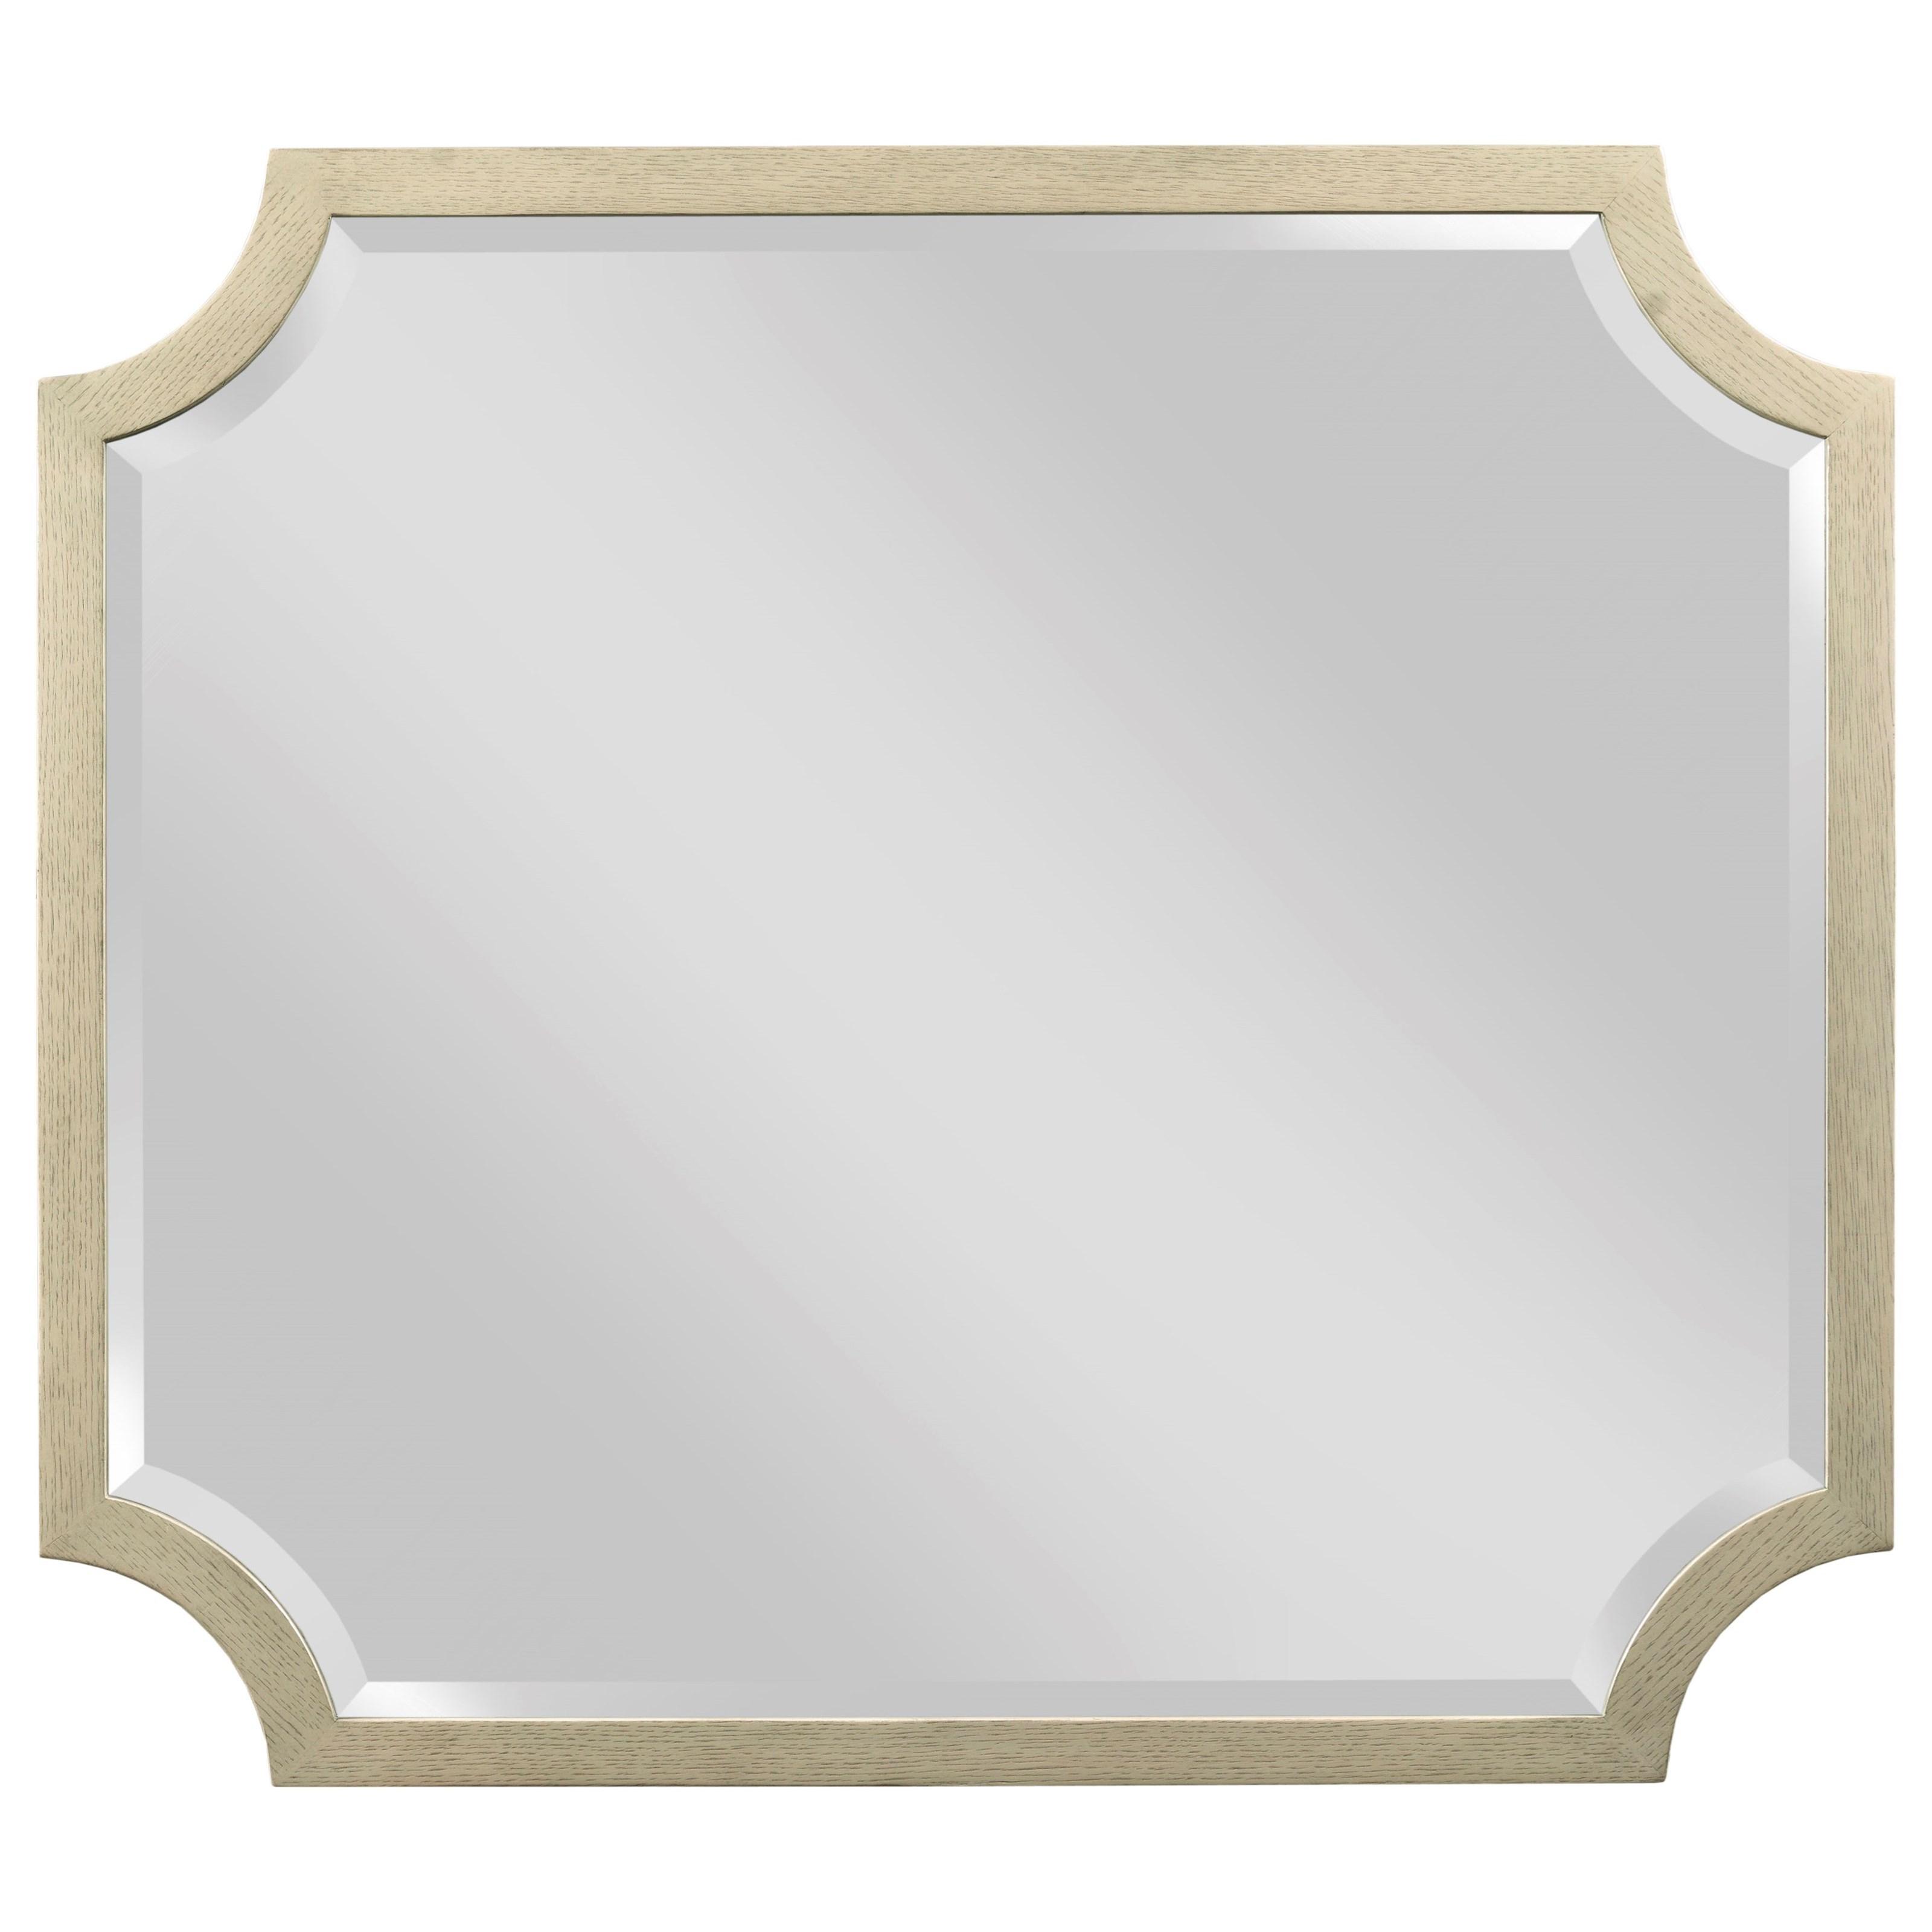 Lenox Mirror by American Drew at Johnny Janosik